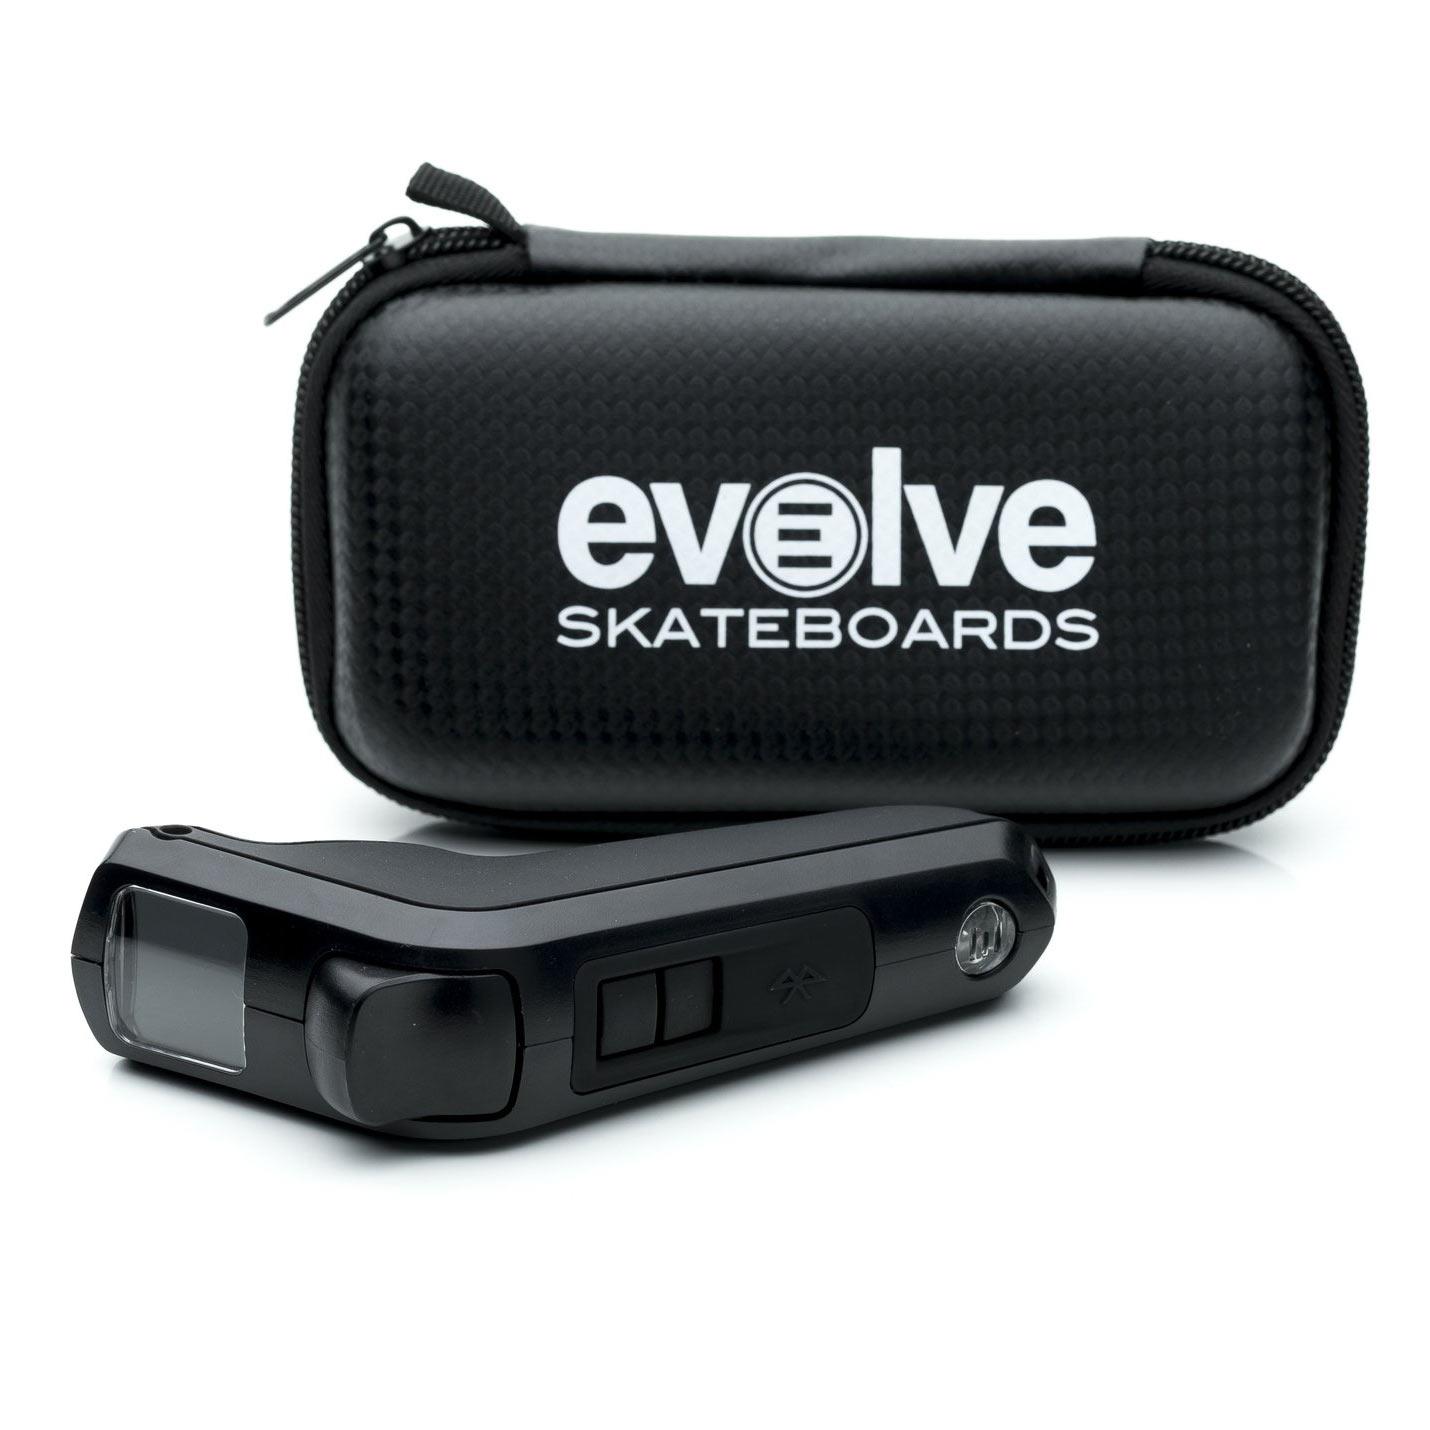 Buy Evolve GTR bluetooth Remote Canada Online Sales Vancouver Pickup